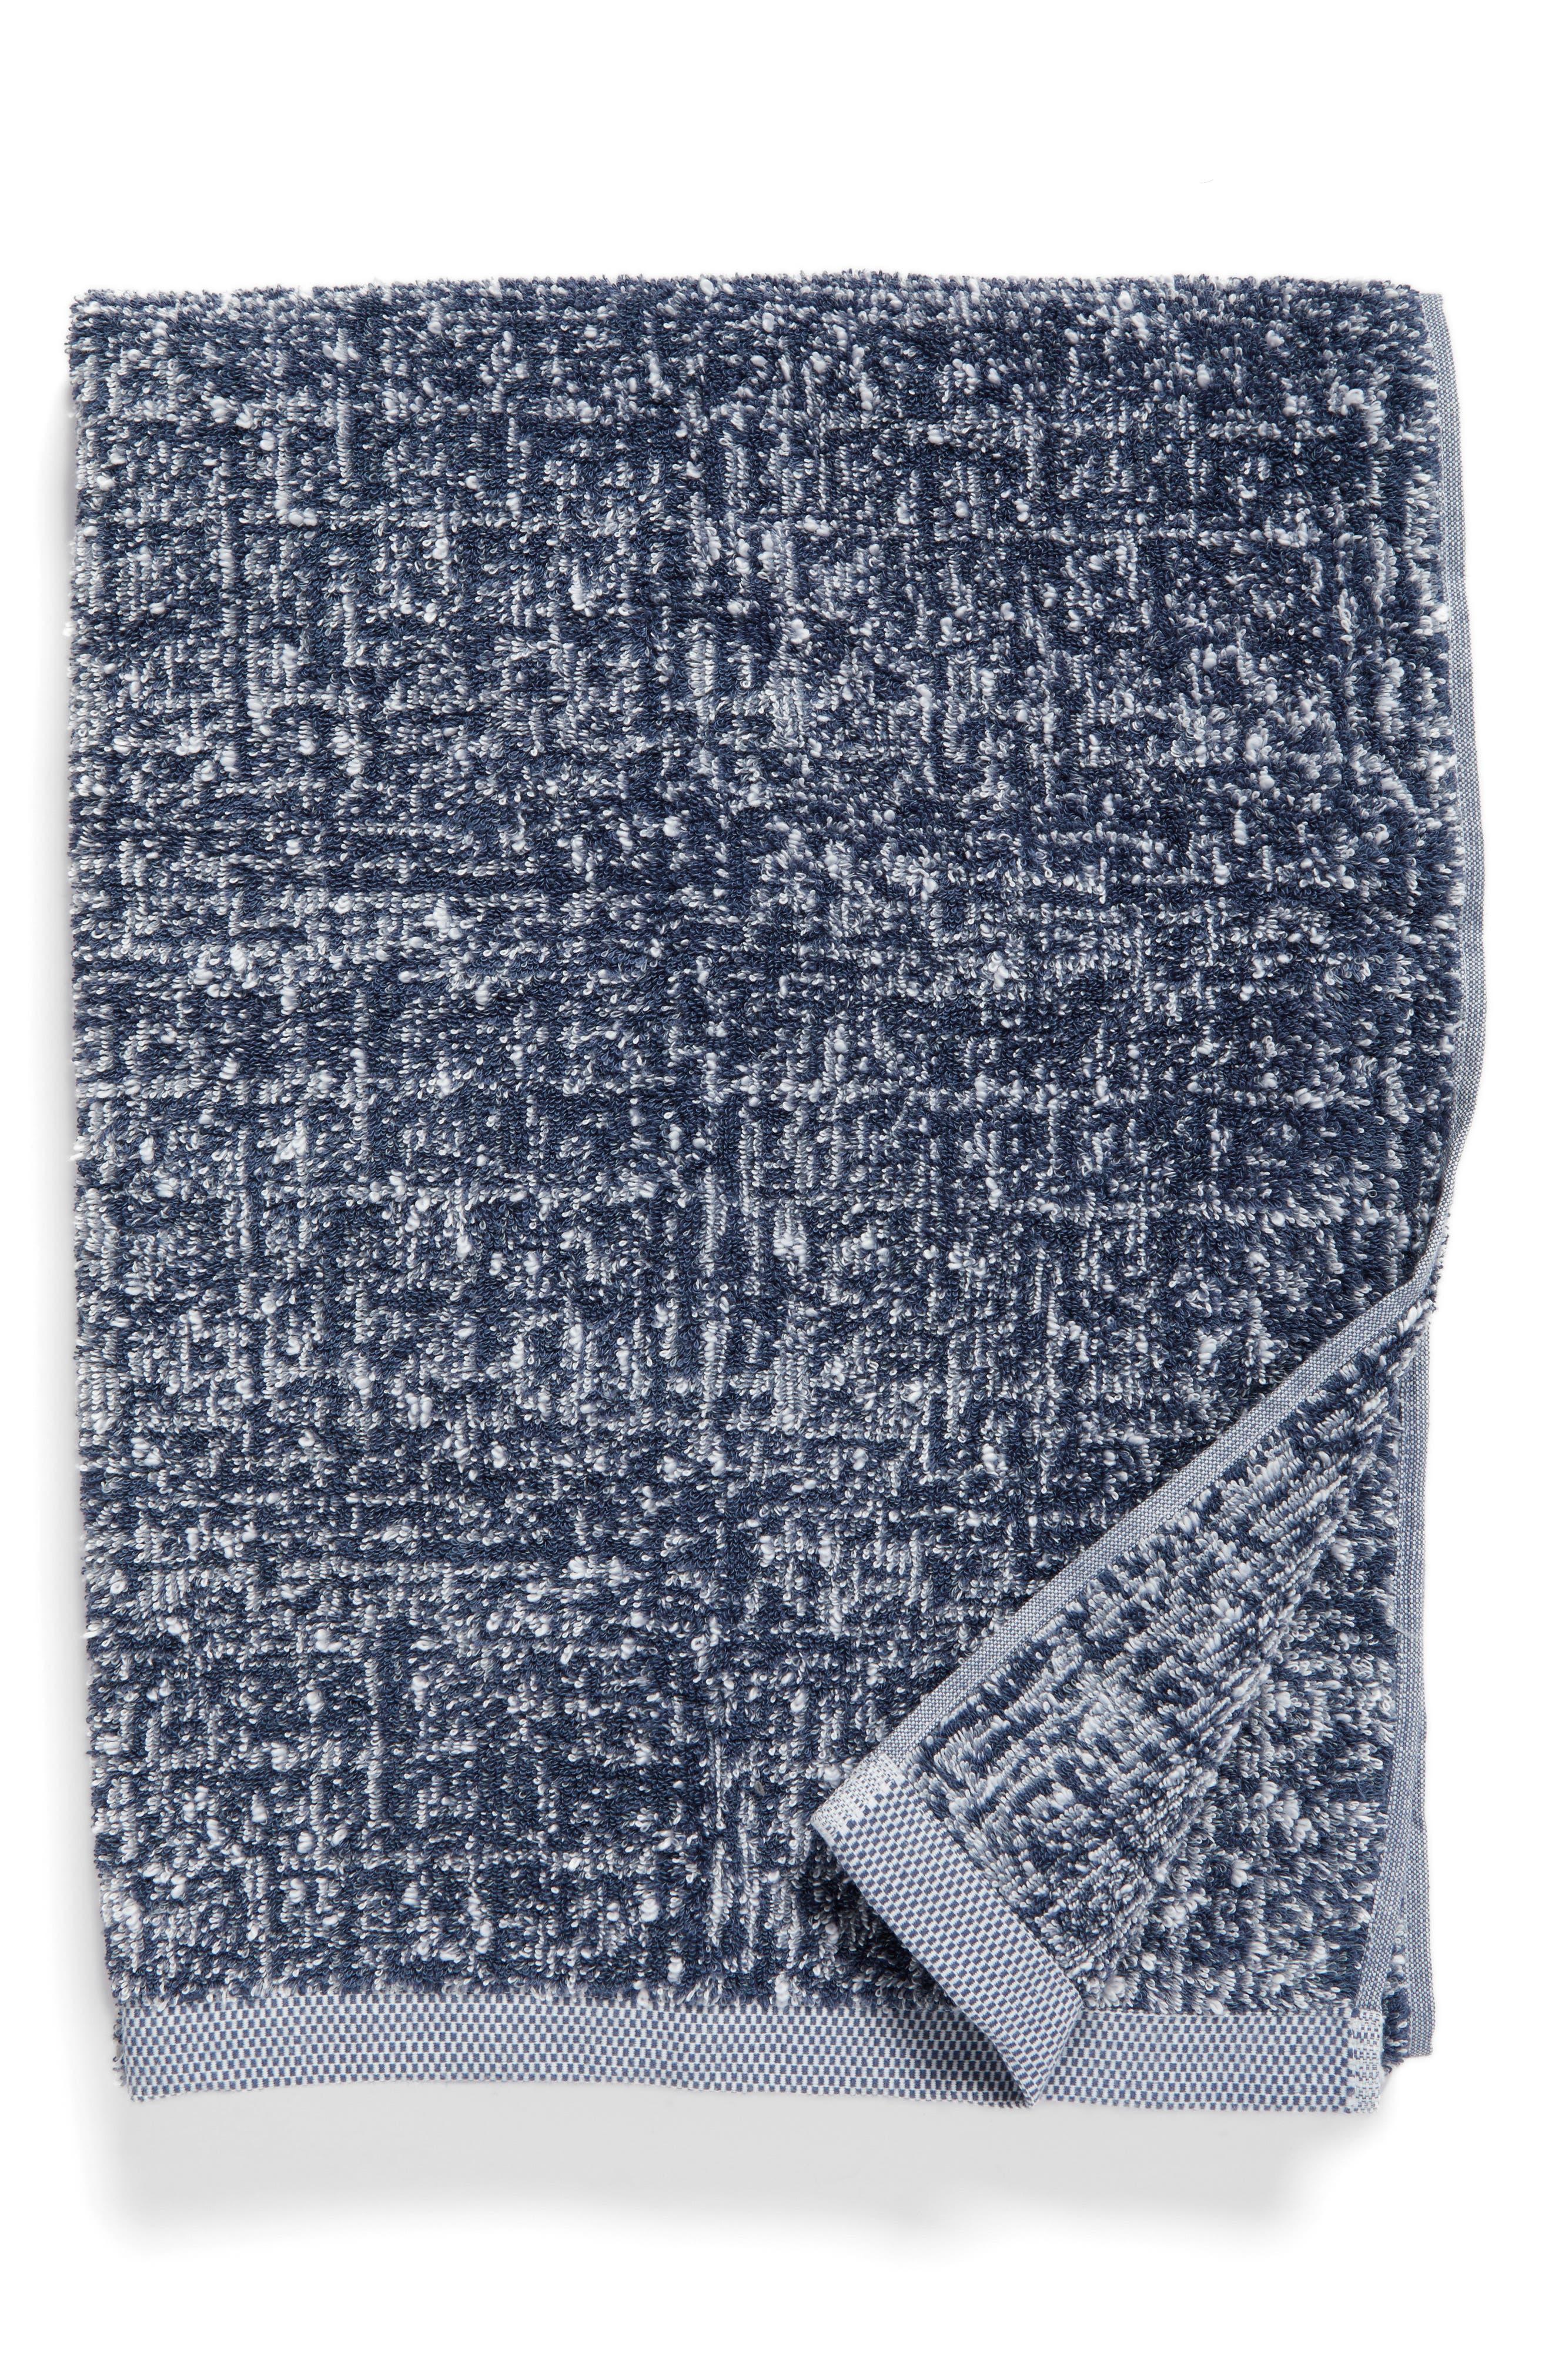 Nordstrom at Home Tweed Jacquard Bath Towel